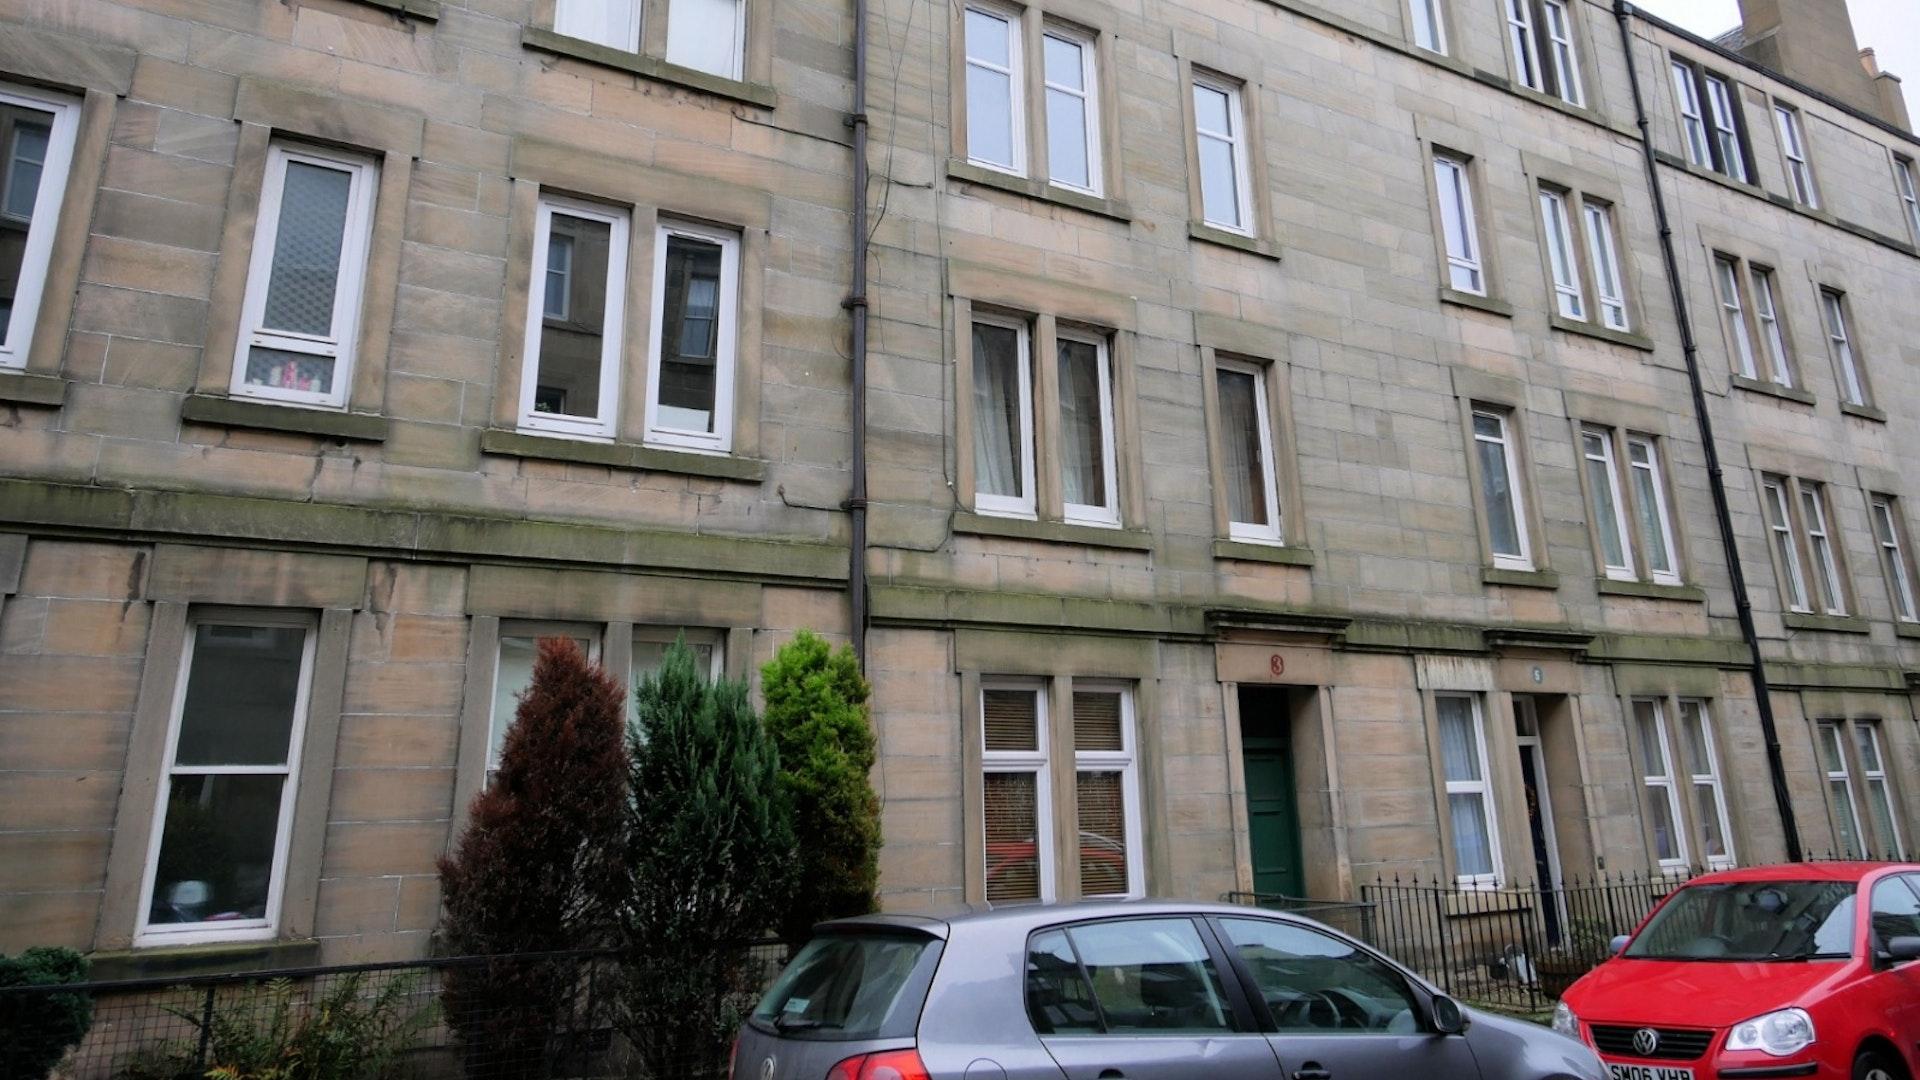 P339: Roseburn Place, Roseburn, Edinburgh